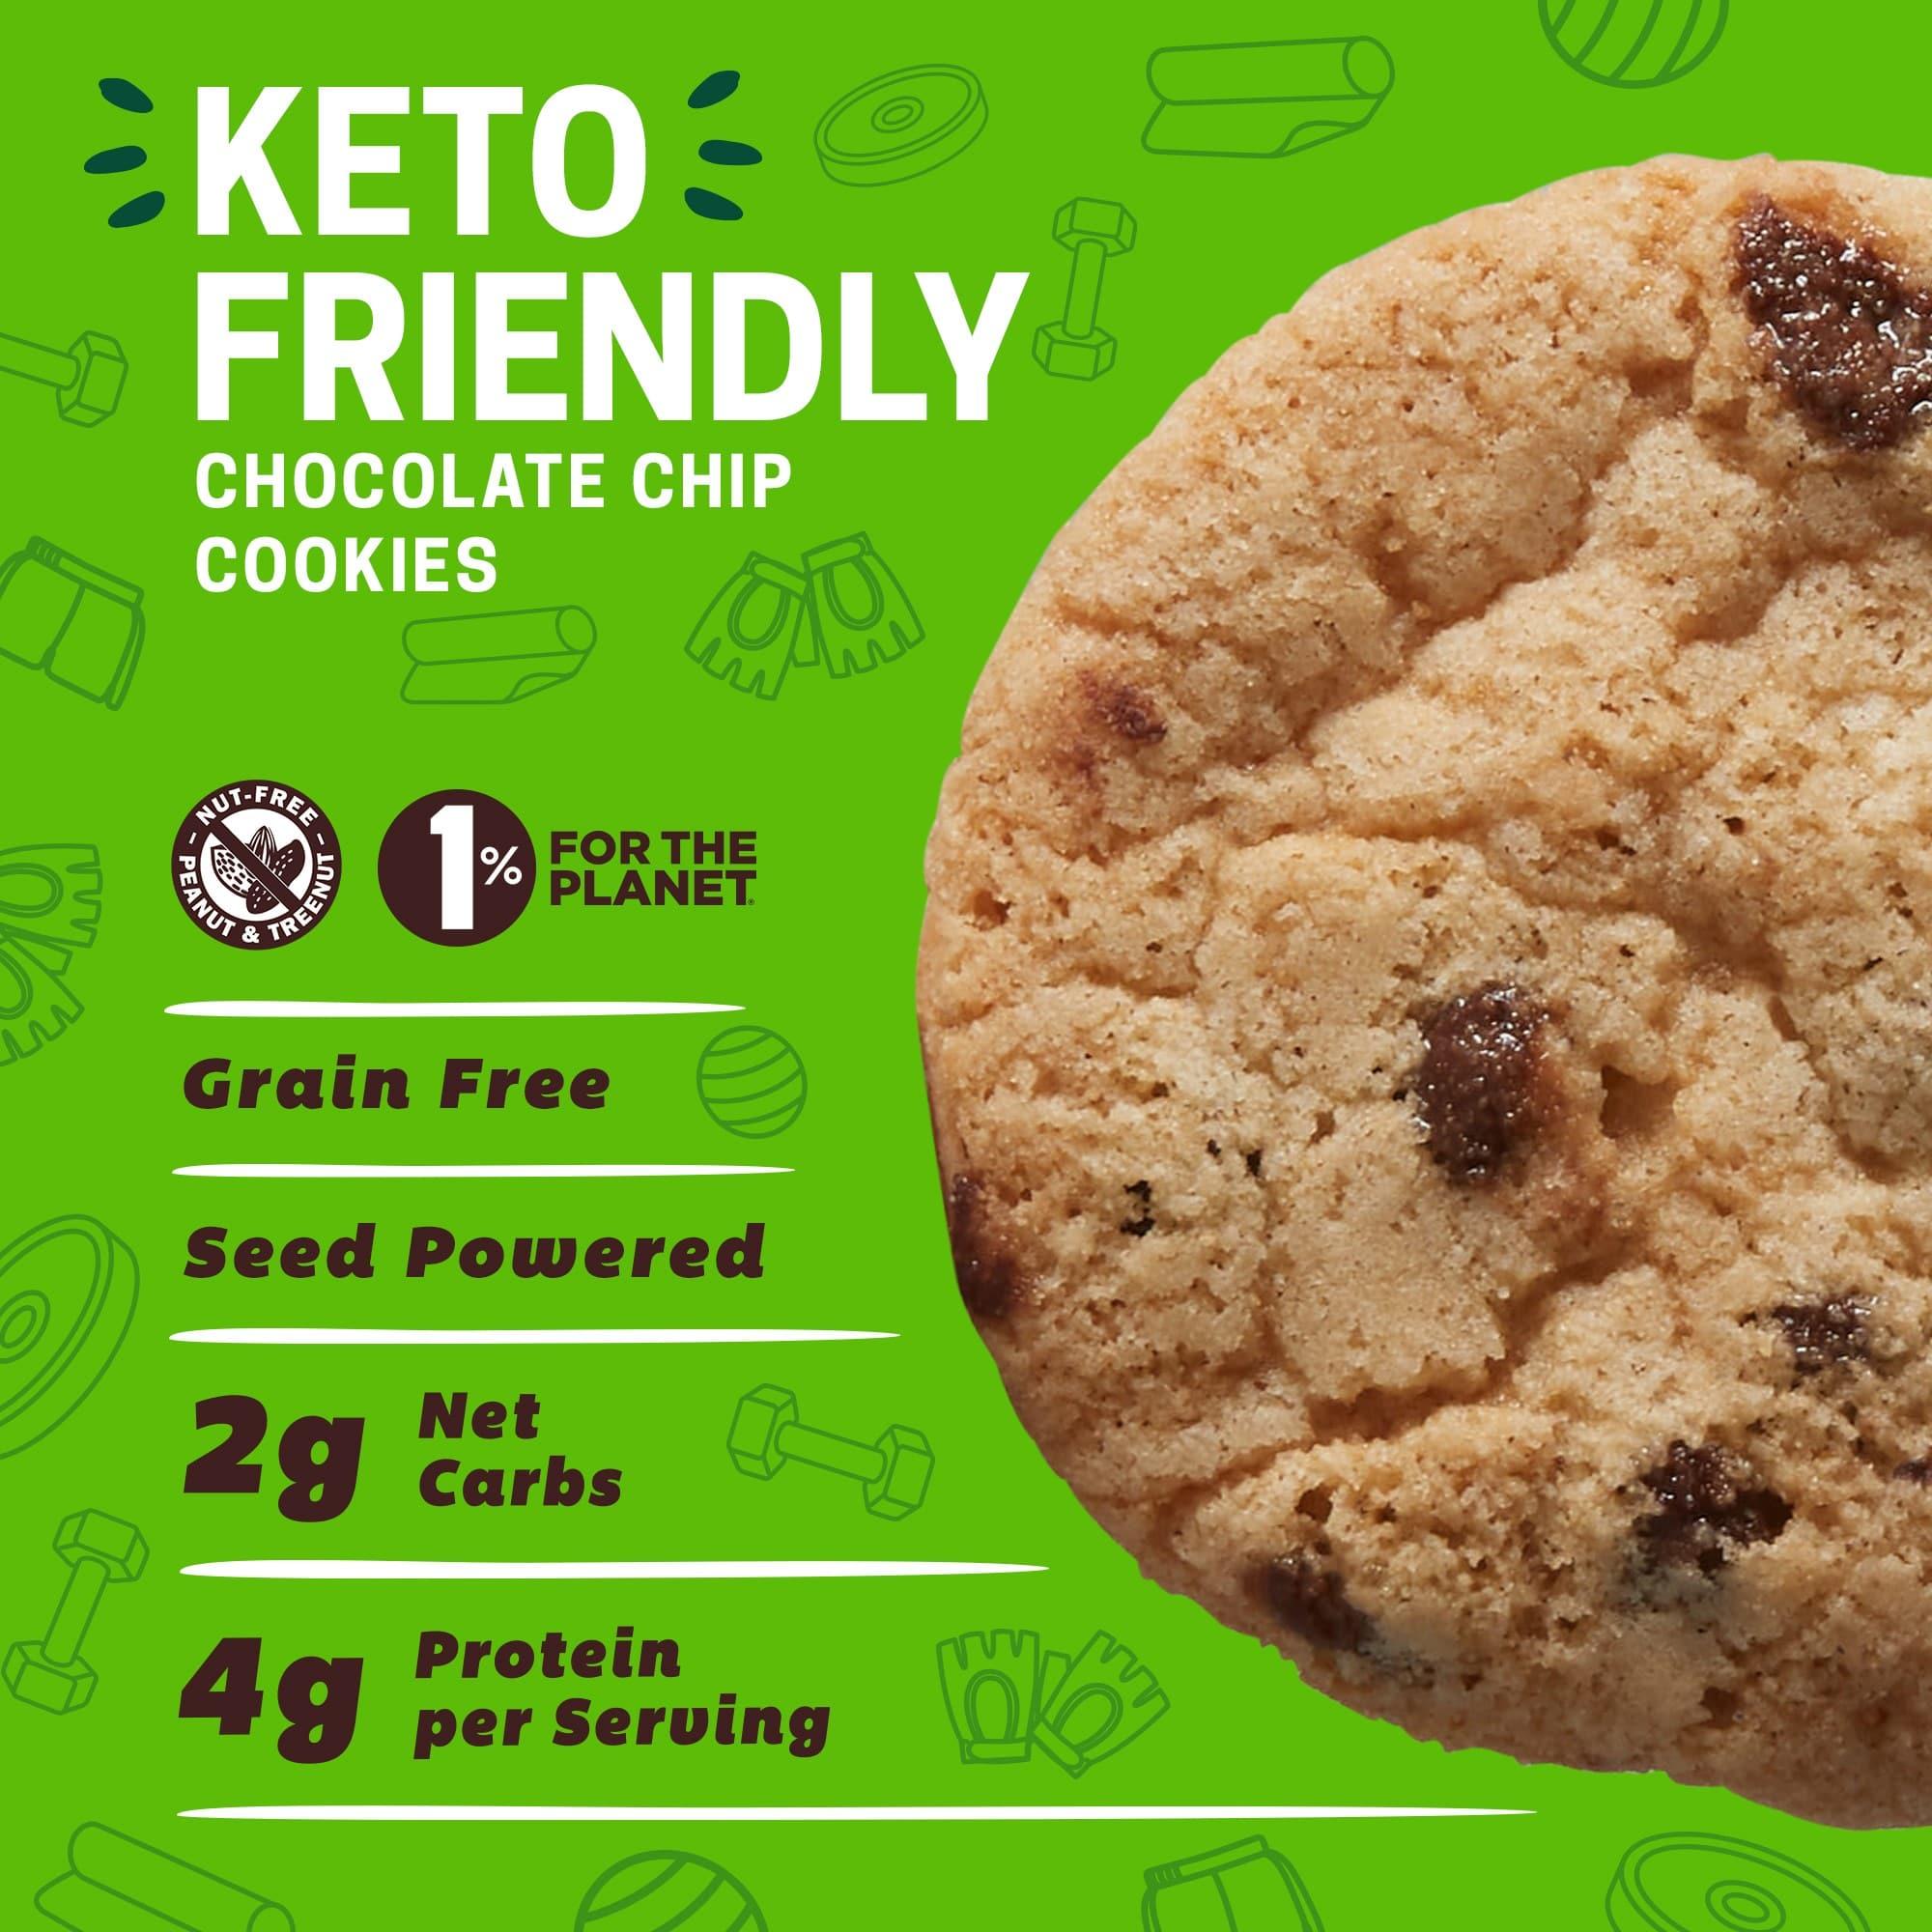 Fancypants Baking Co. Announces Hannaford Supermarket Distribution for Keto-Friendly Cookies